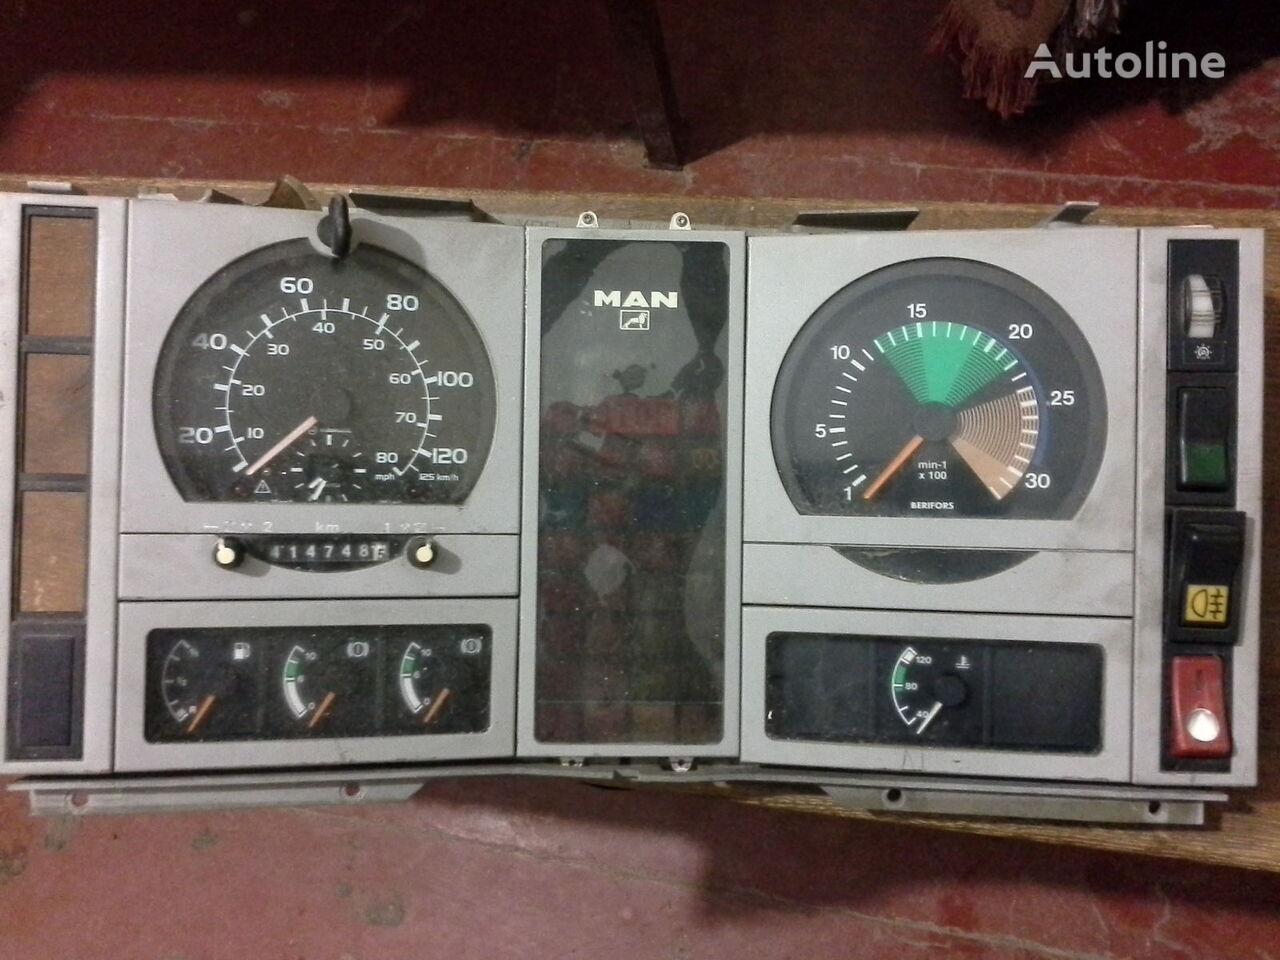 MAN Spidometr Tahometr originalni zapchasti kabini tacógrafo para MAN  L2000 Po zapchastyam camión